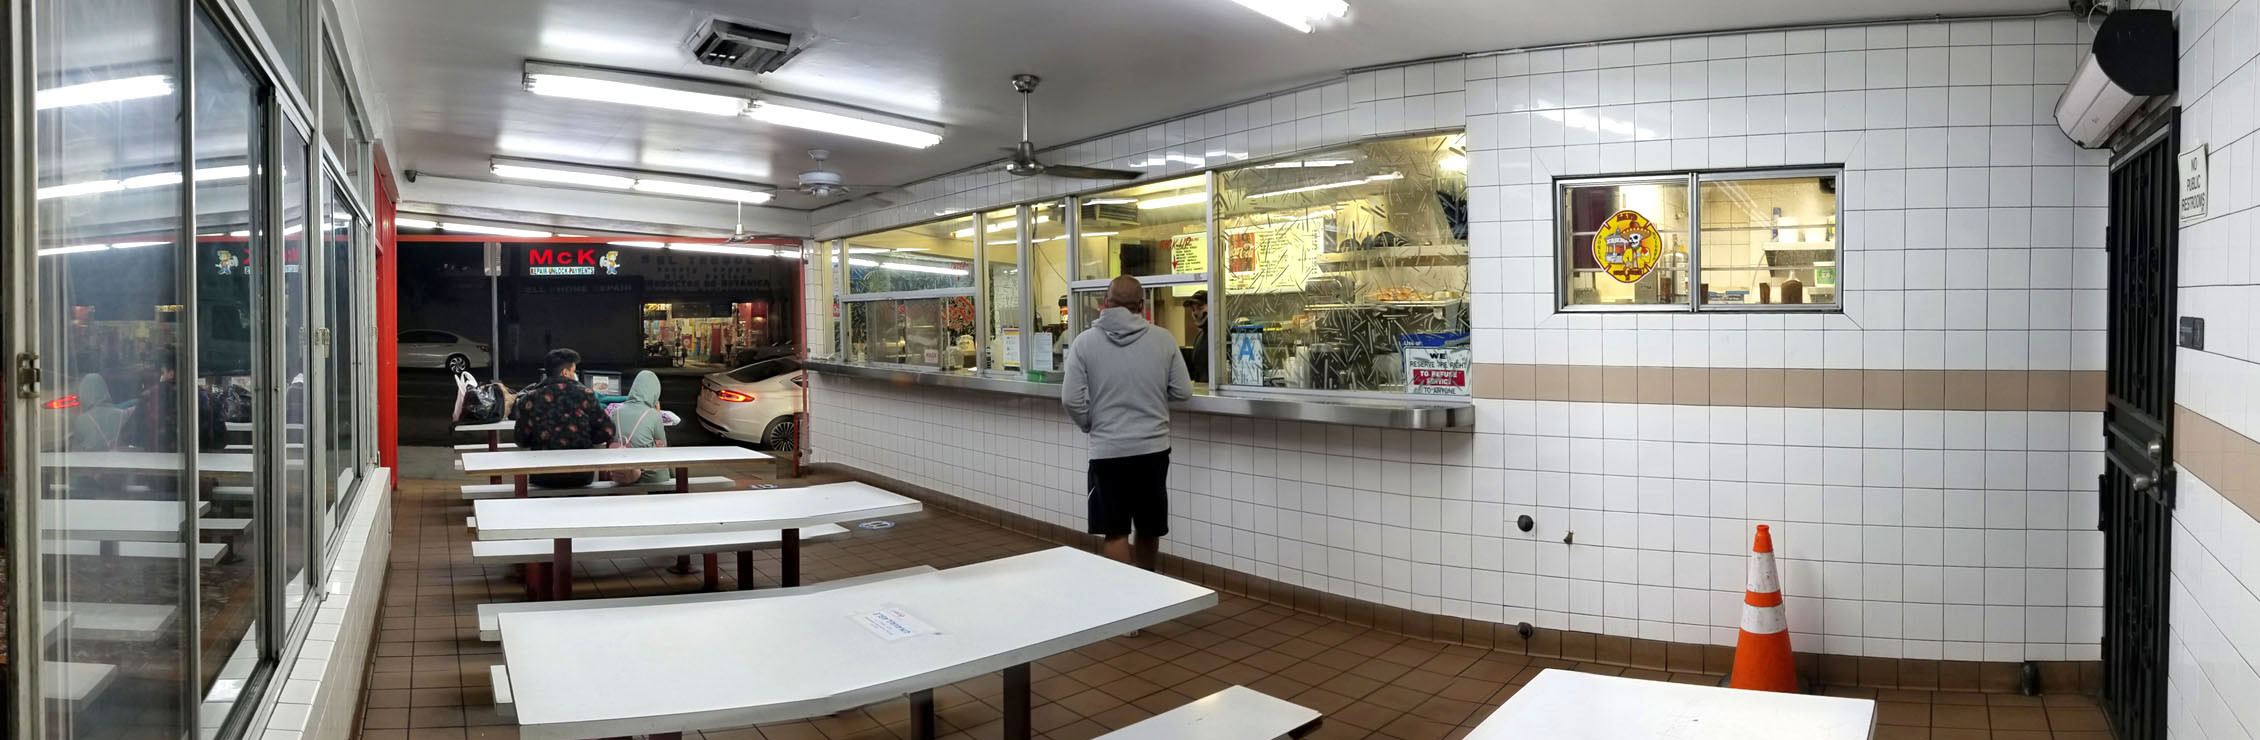 George's Burger Stand Interior